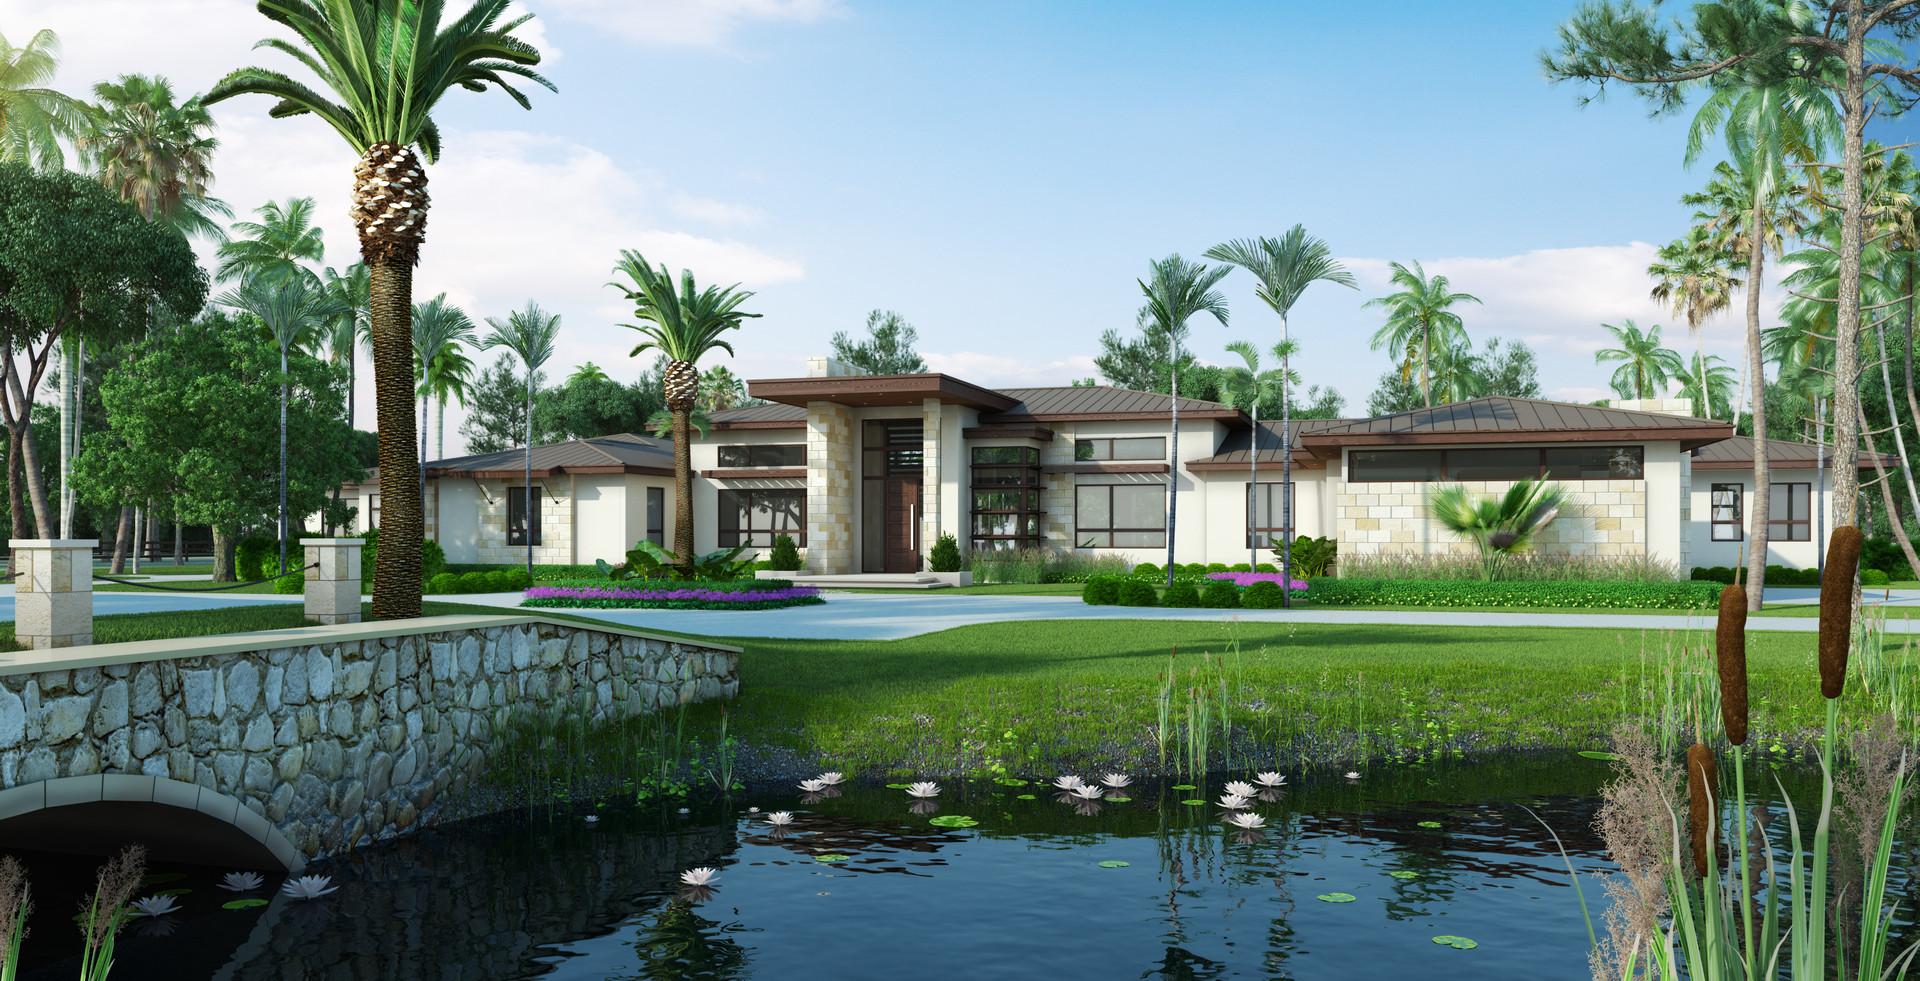 milagro house rendering FRONT.jpg